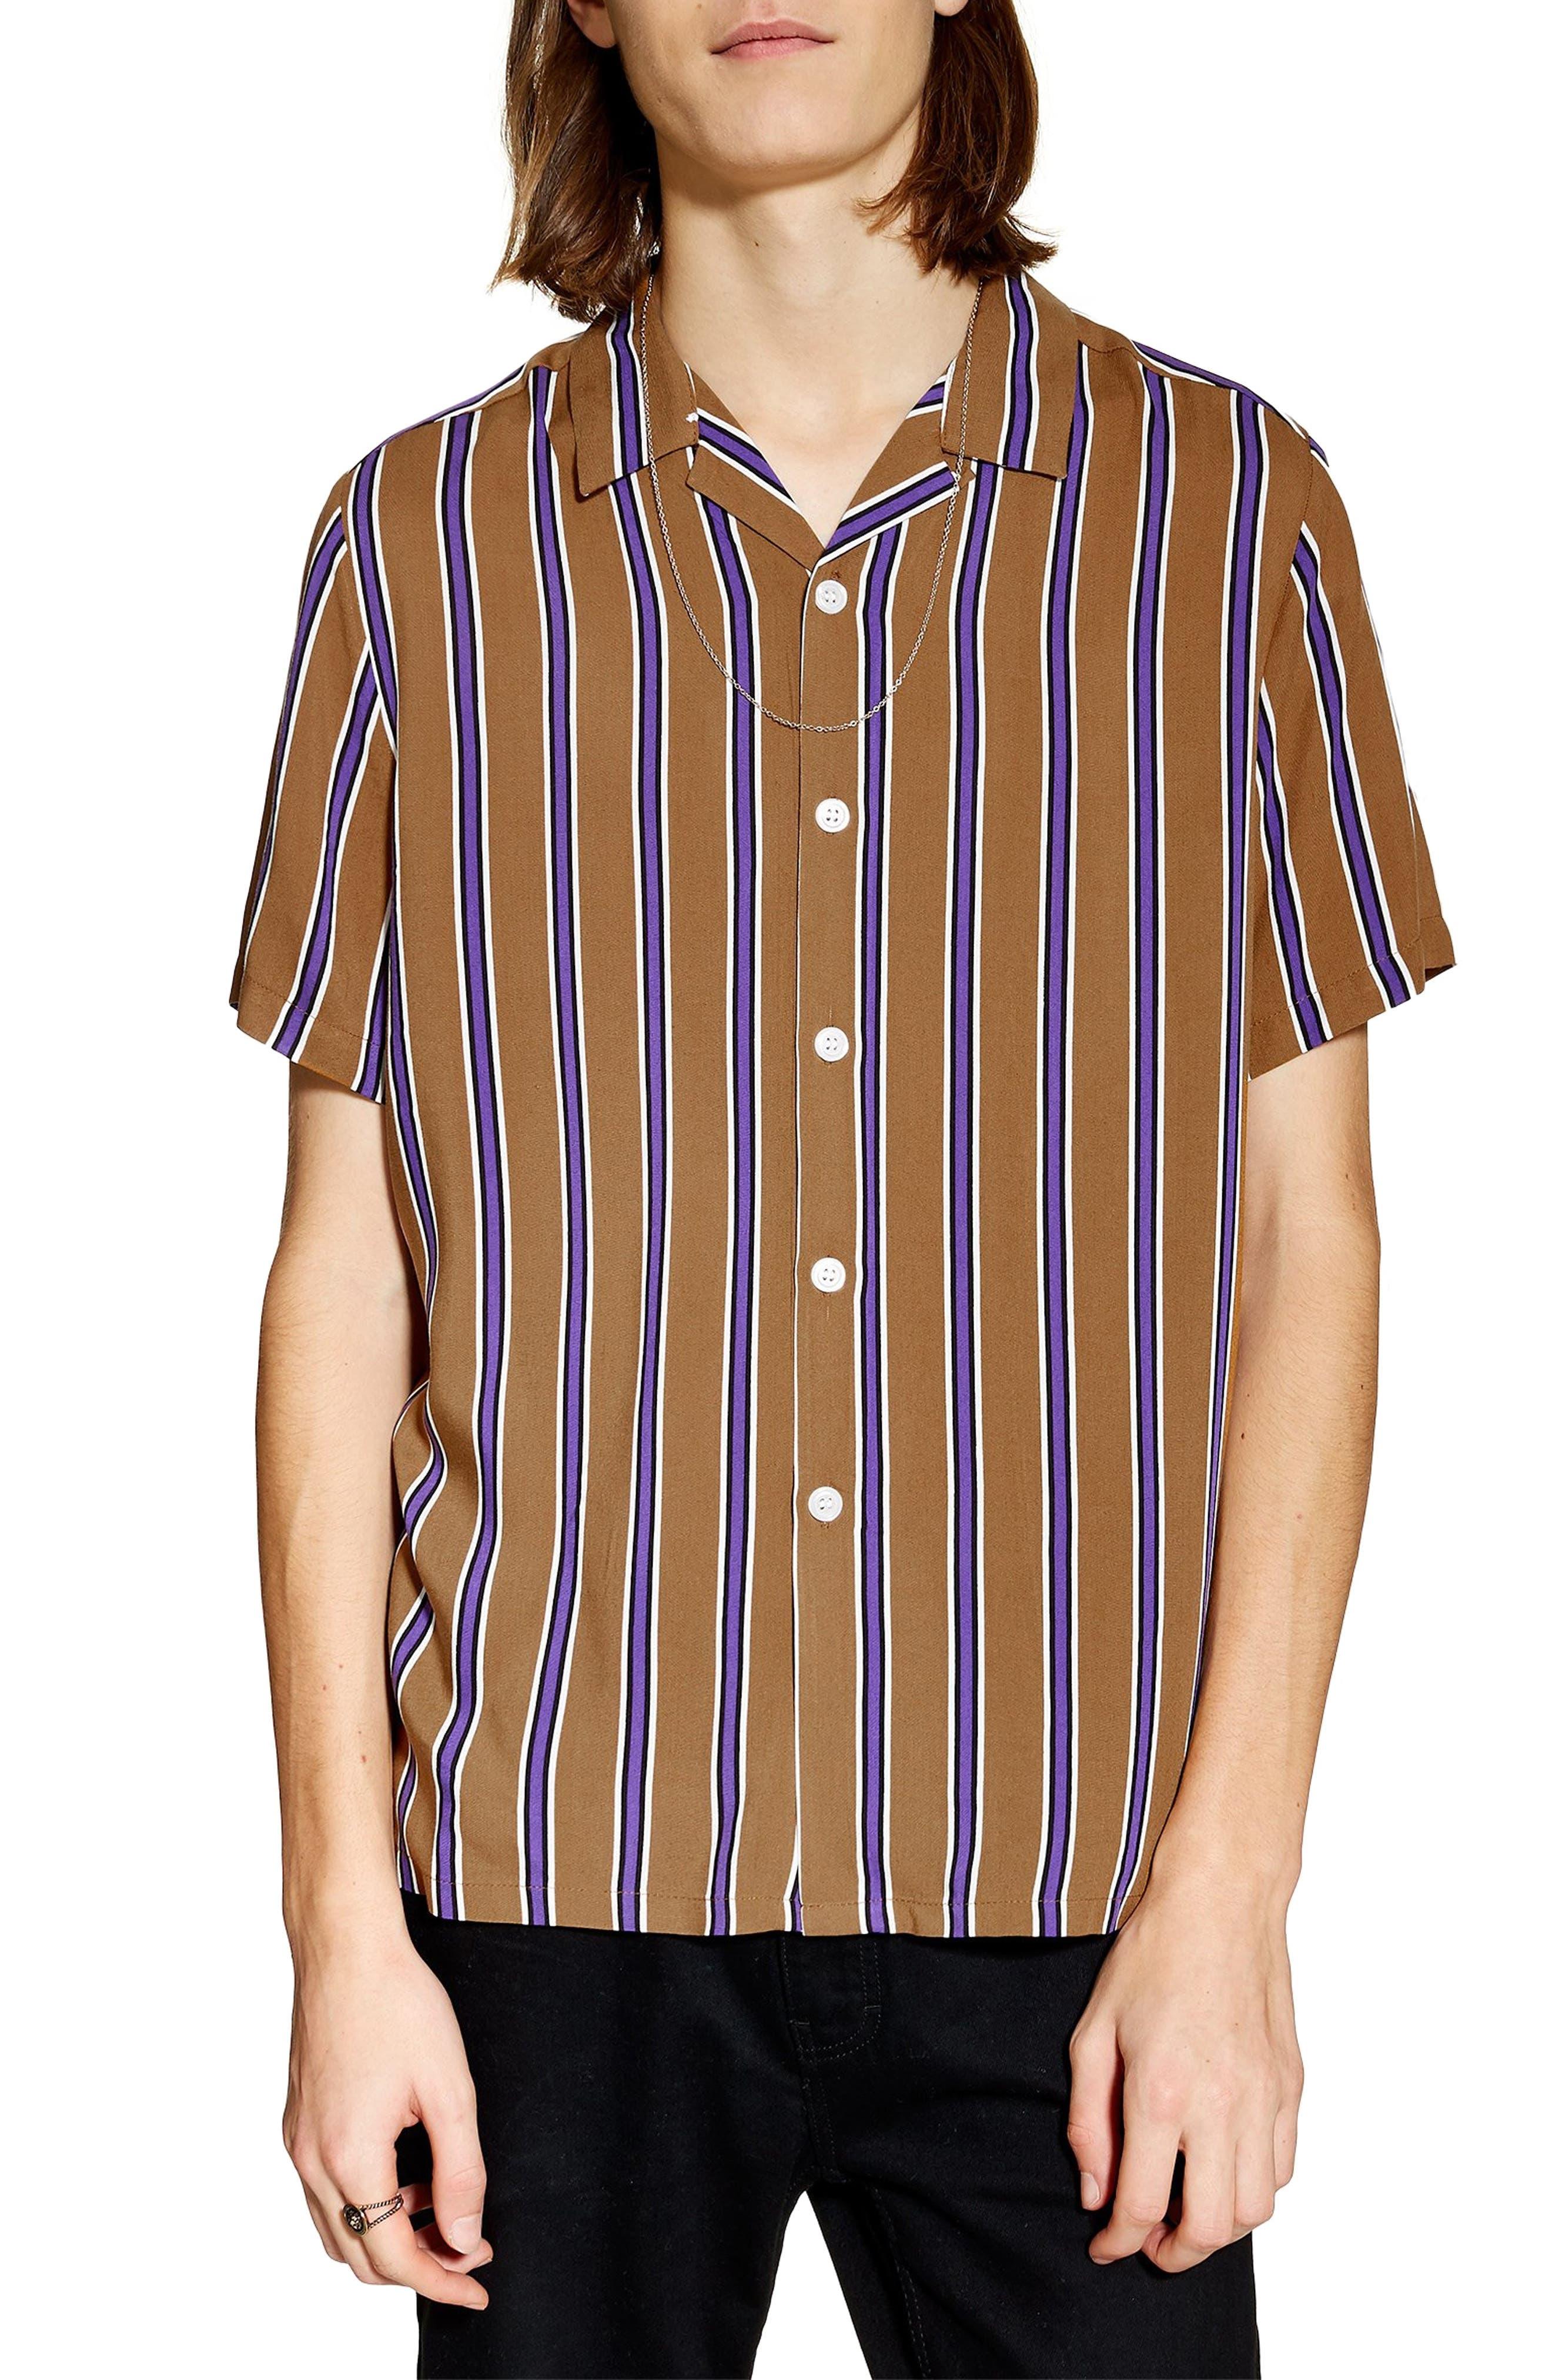 TOPMAN,                             Stripe Revere Collar Camp Shirt,                             Main thumbnail 1, color,                             BROWN MULTI